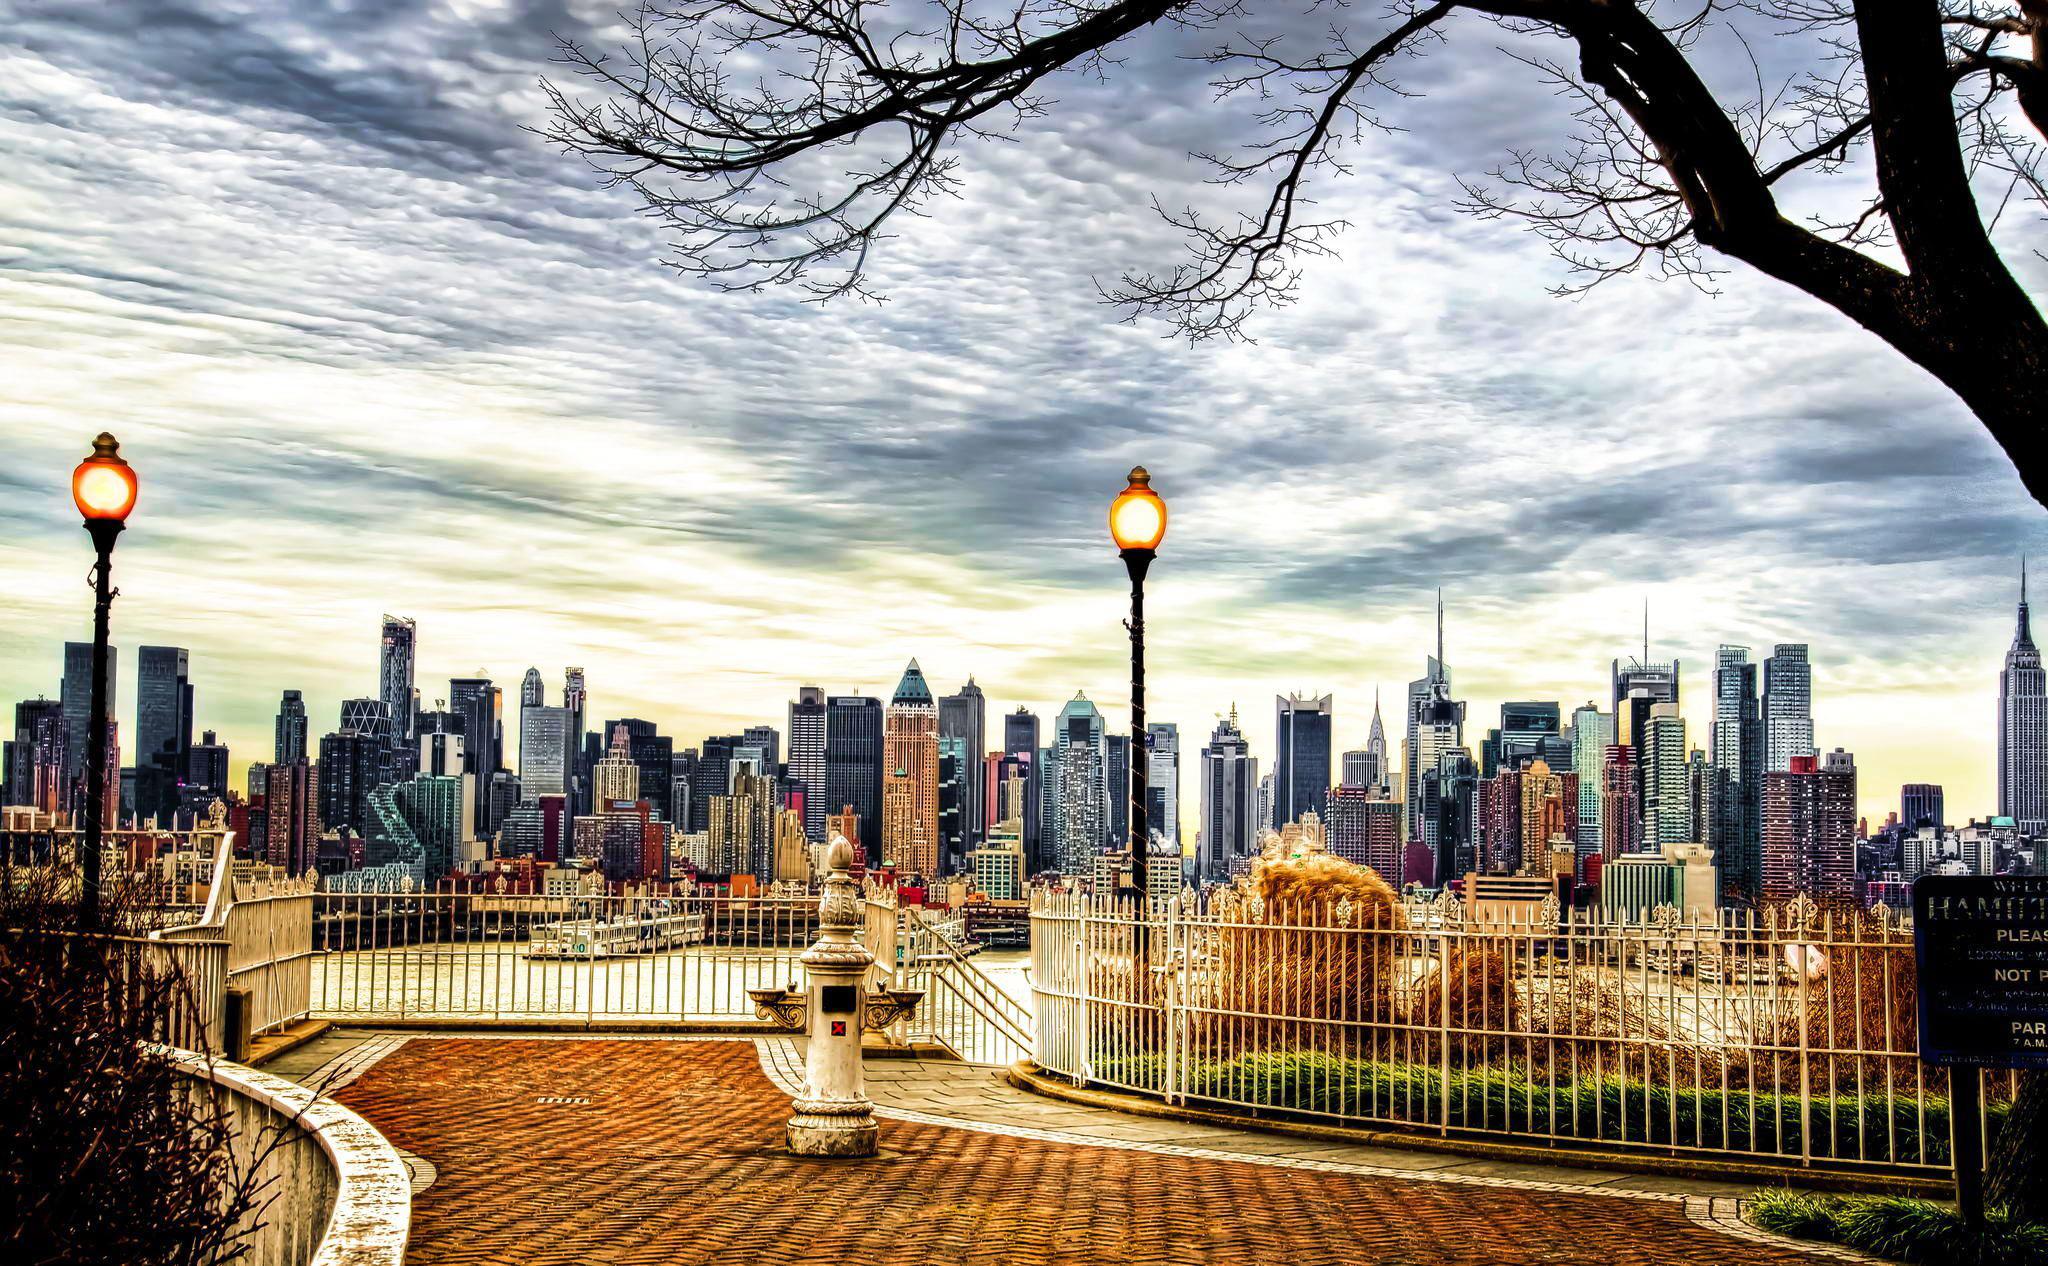 Ultra Hd New York Wallpaper 4k - HD Wallpaper